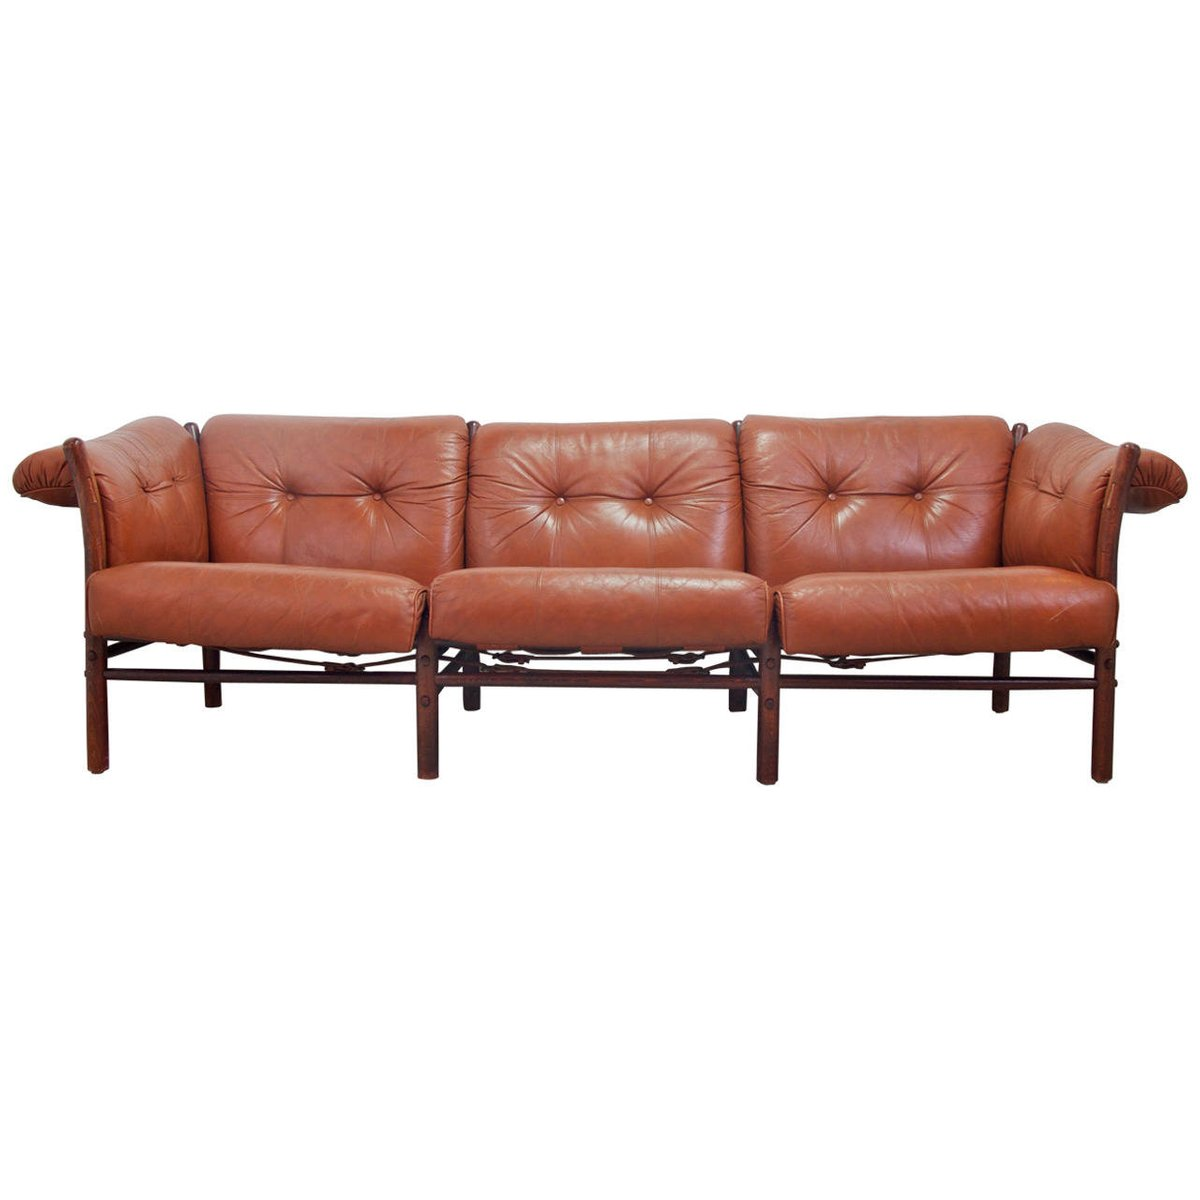 vintage swedish ilona leather sofa by arne norell for. Black Bedroom Furniture Sets. Home Design Ideas